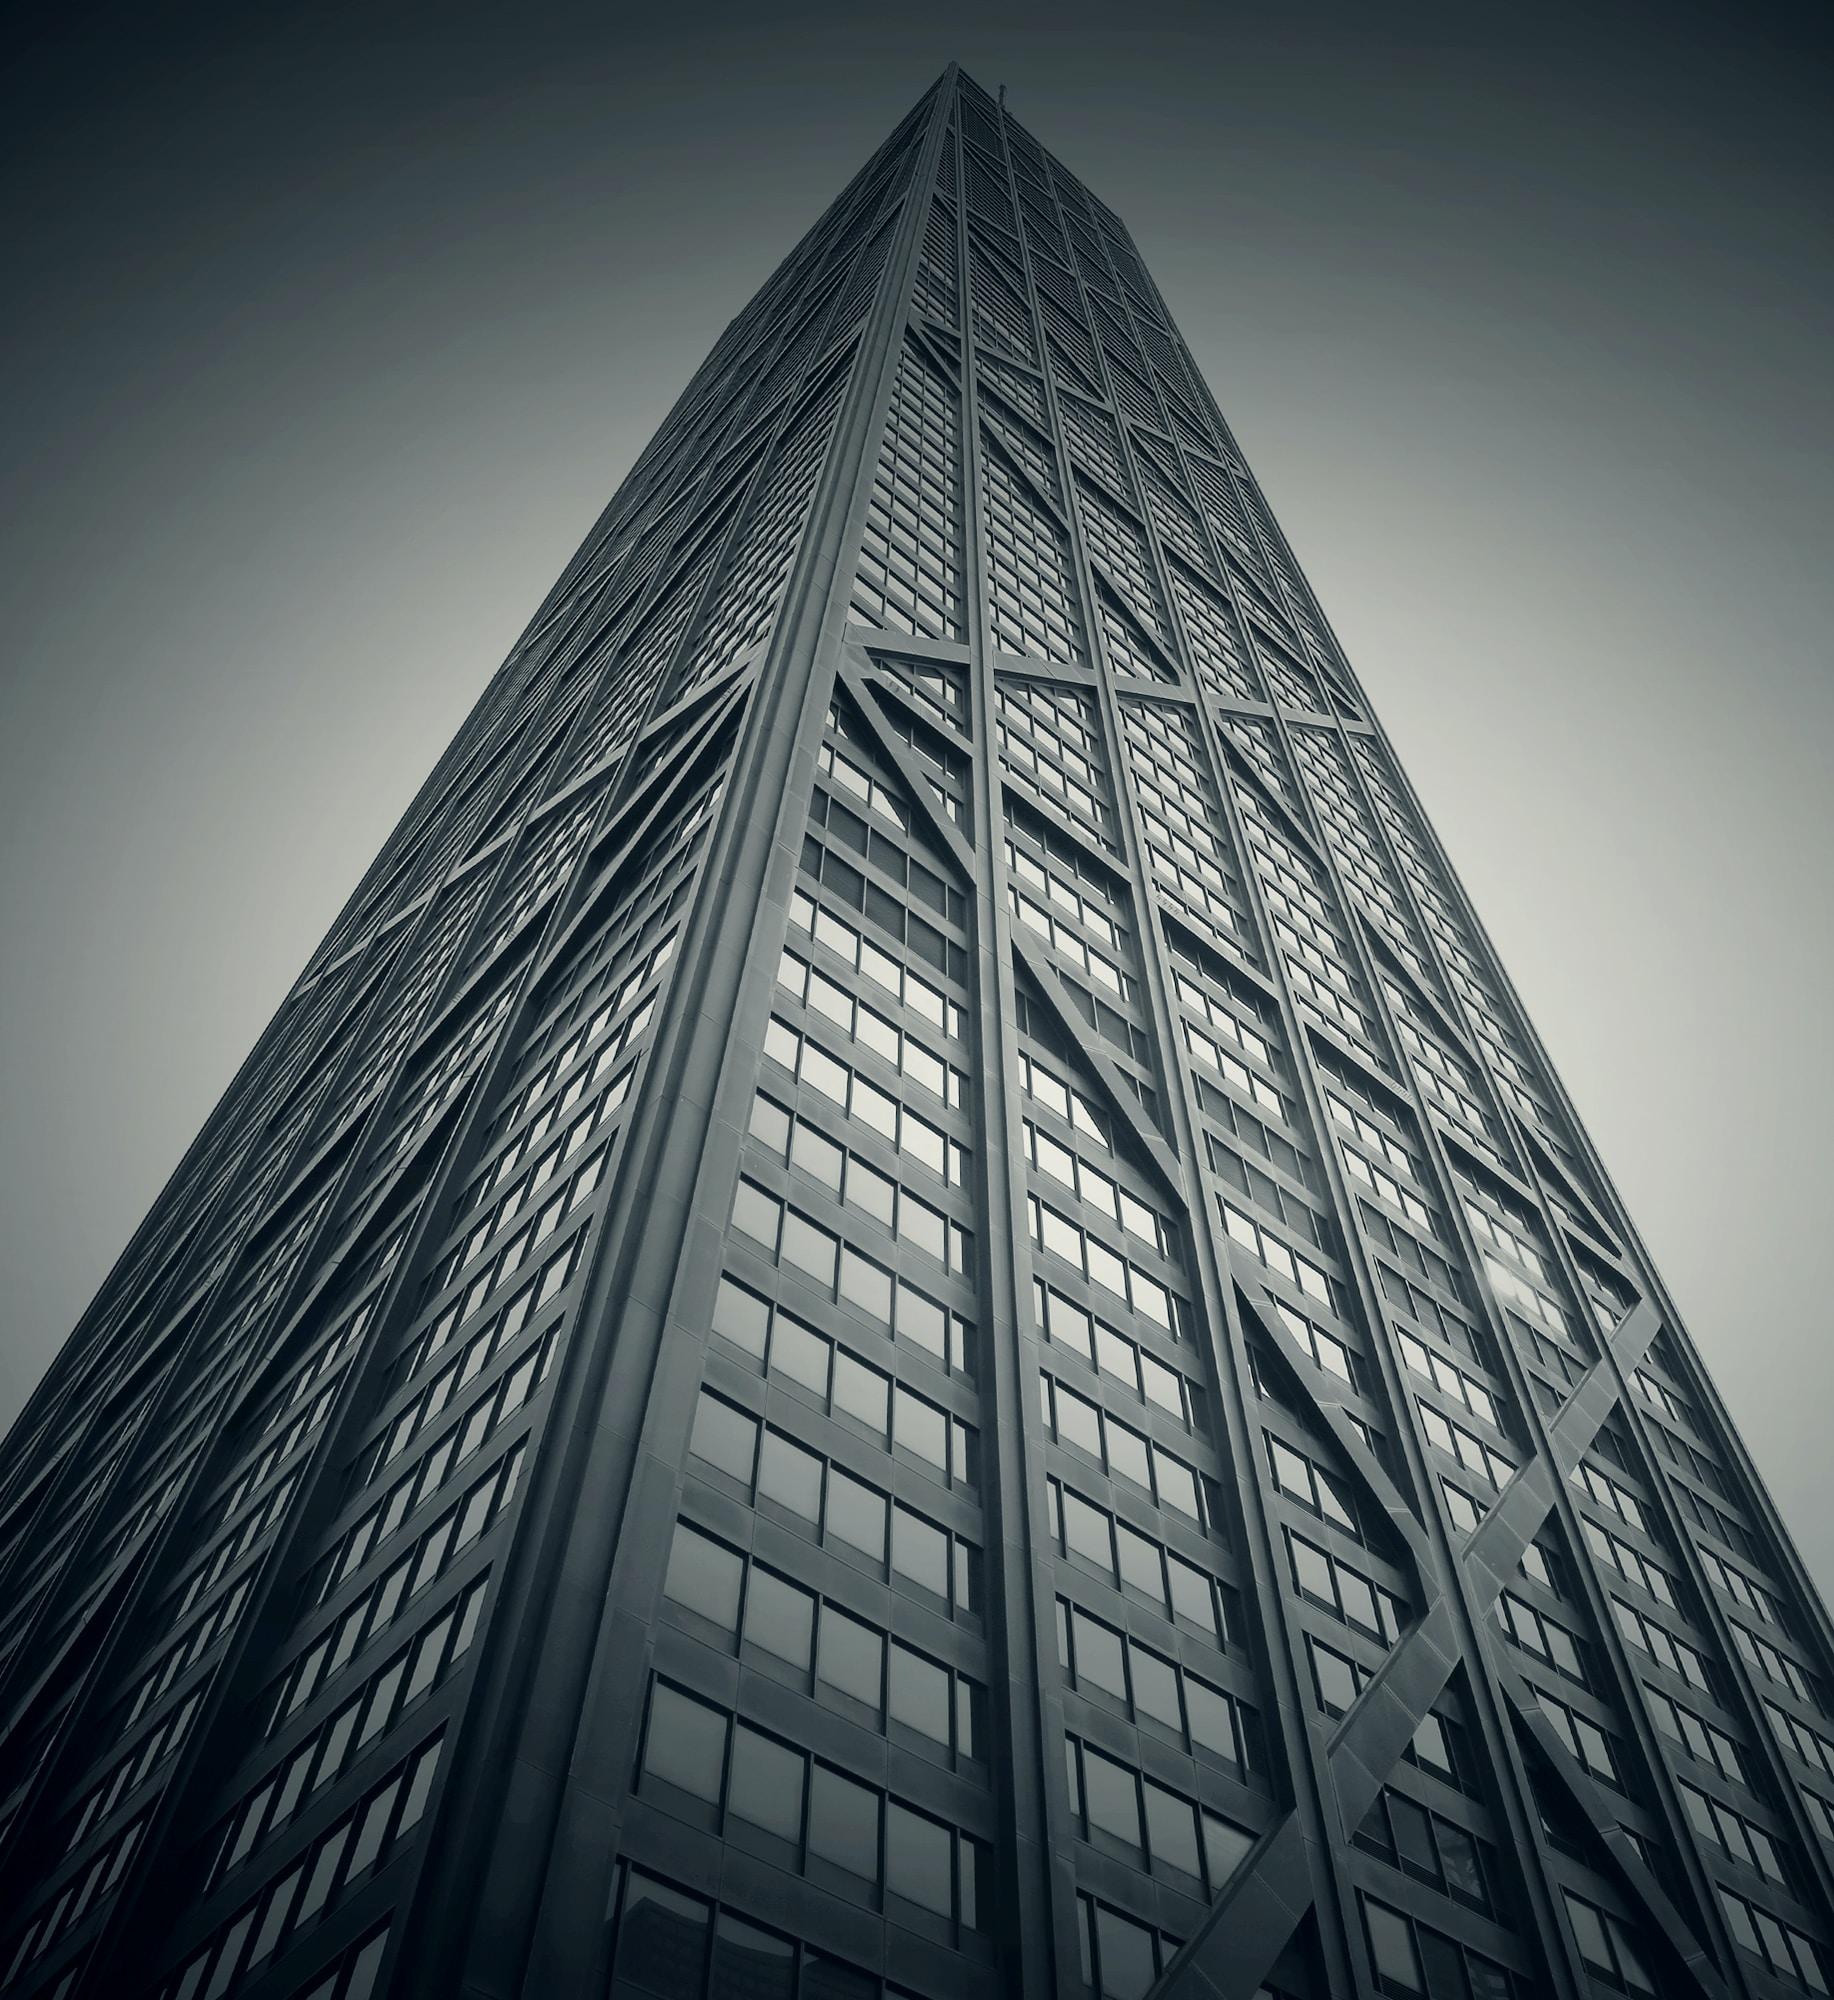 A desaturated shot of a tall skyscraper